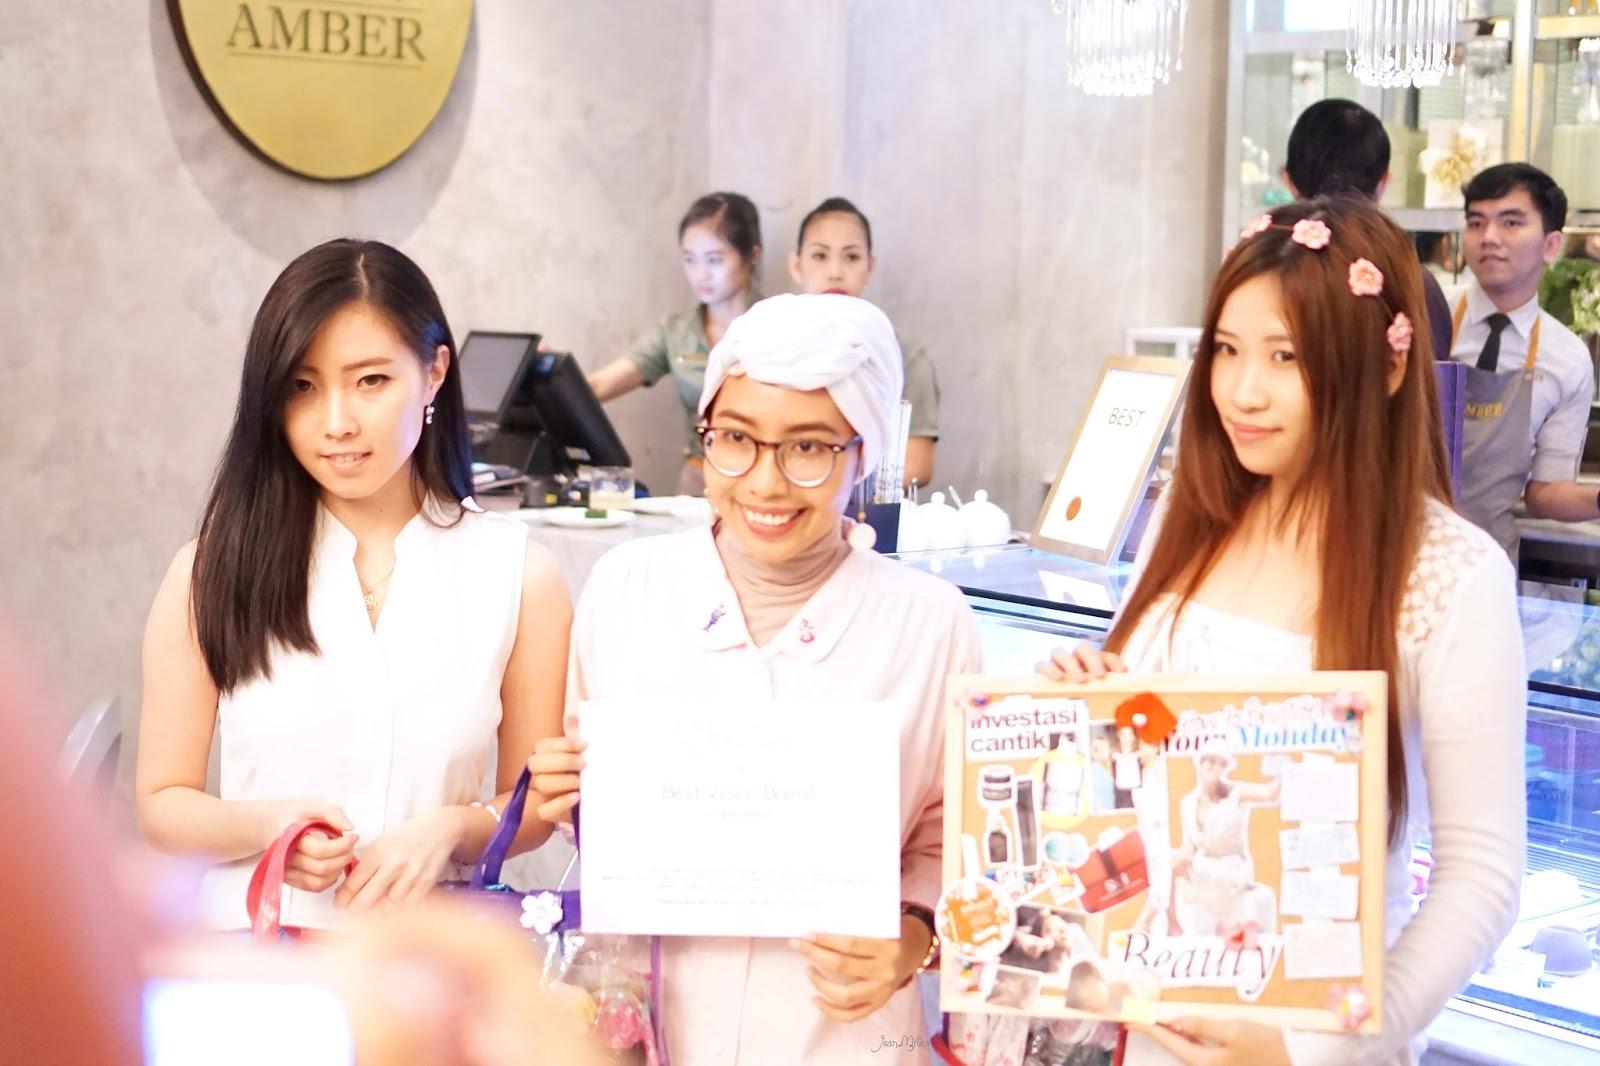 blogger gathering, beauty blogger indonesia. beauty blogger, jean milka, jeanmilka, shinzui, shinzui ume, blogger gathering jakarta, kawaii beauty japan, event with jean milka, indonesian beauty blogger